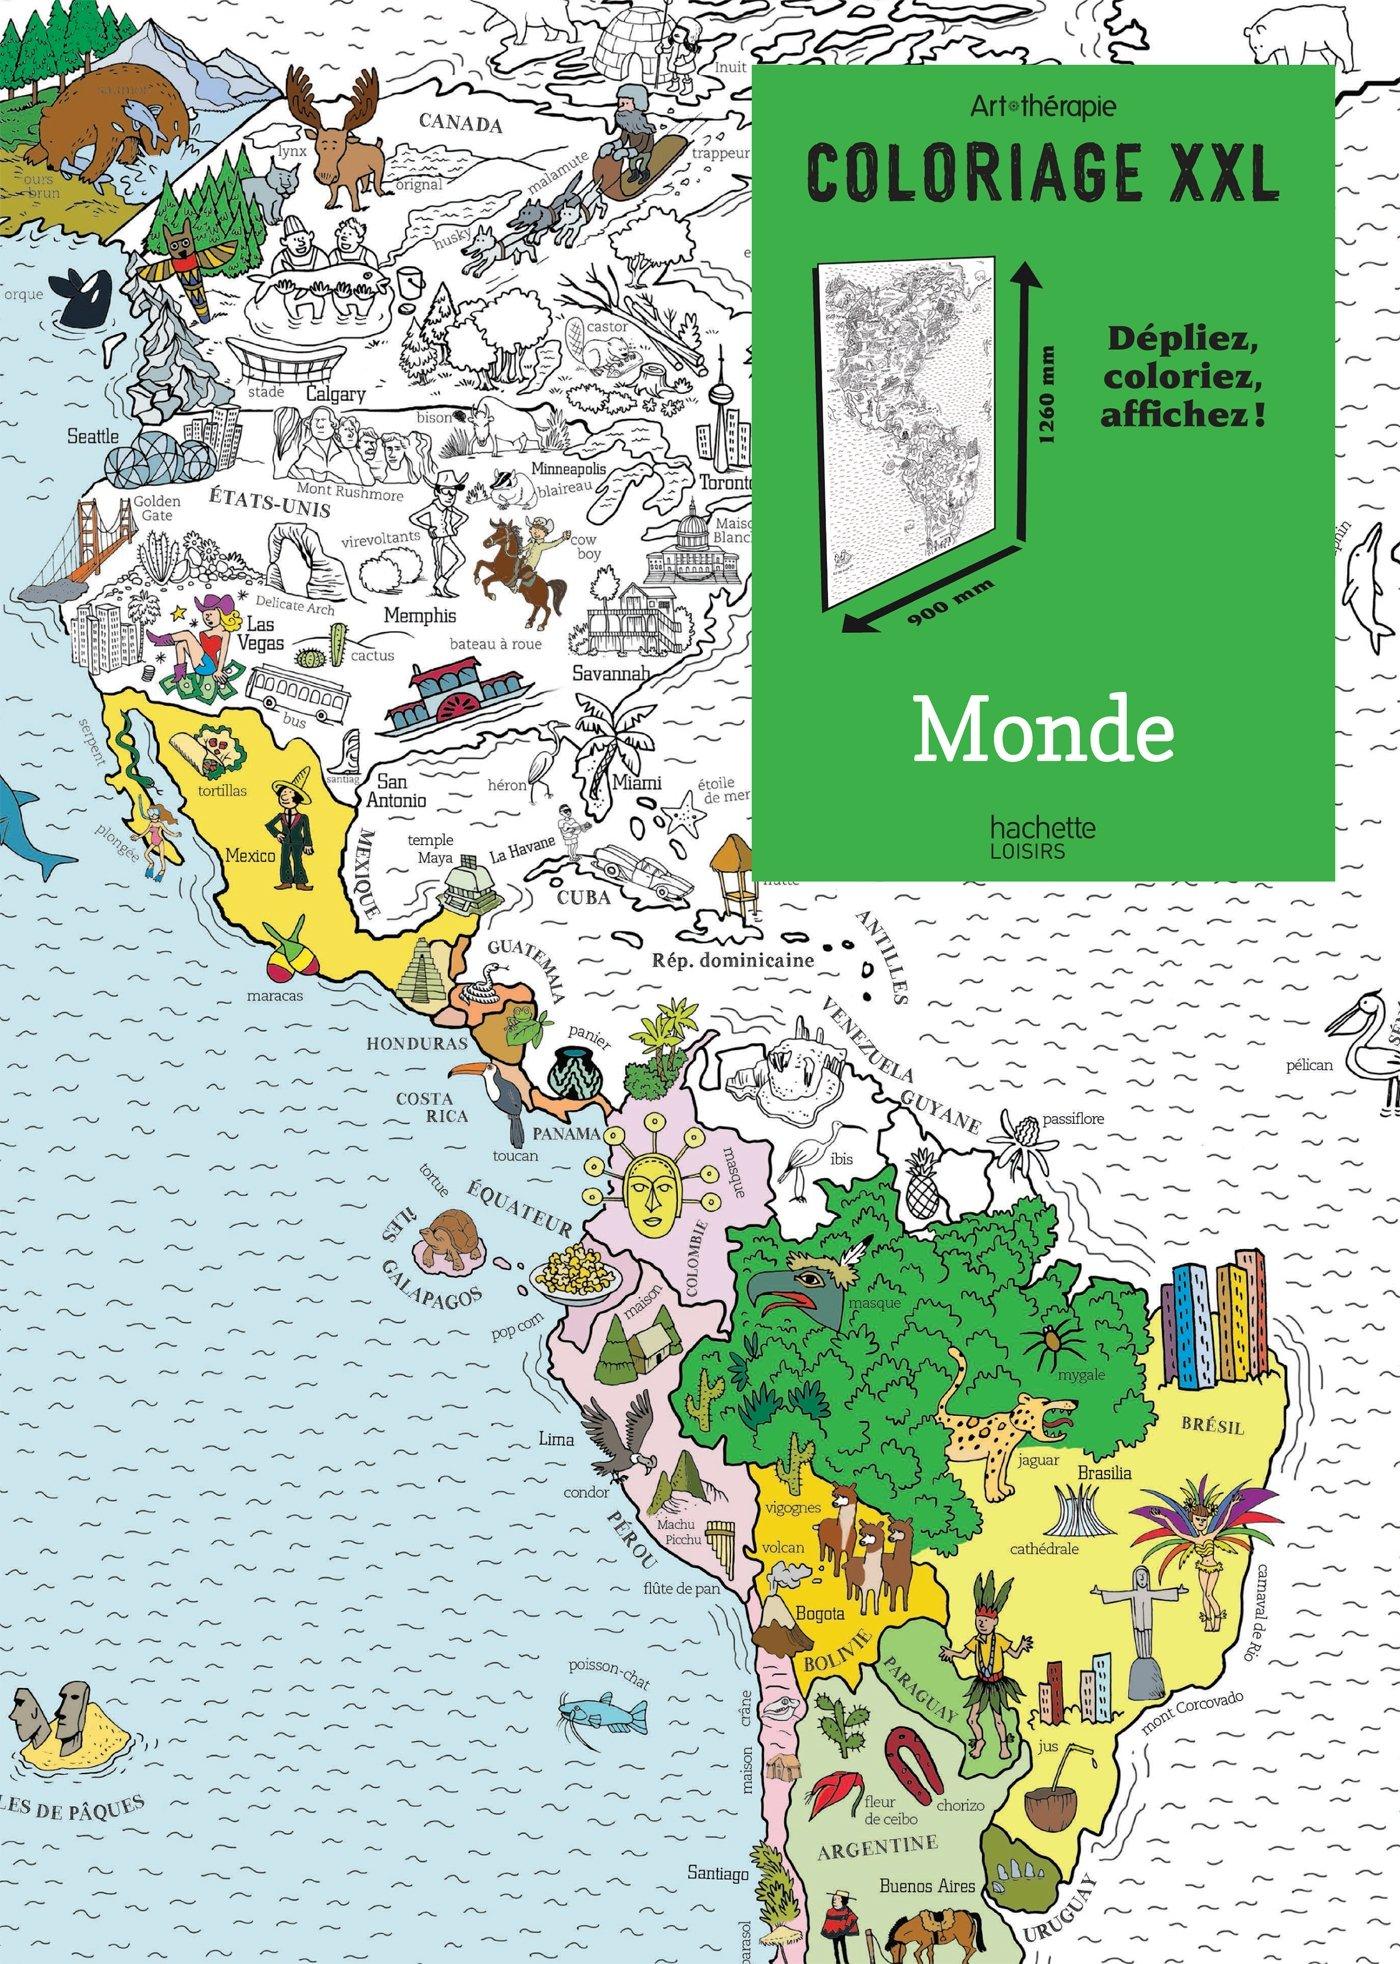 Coloriage Xxl Monde French Edition Mademoiselle Eve Hachette 9782013968799 Amazon Com Books